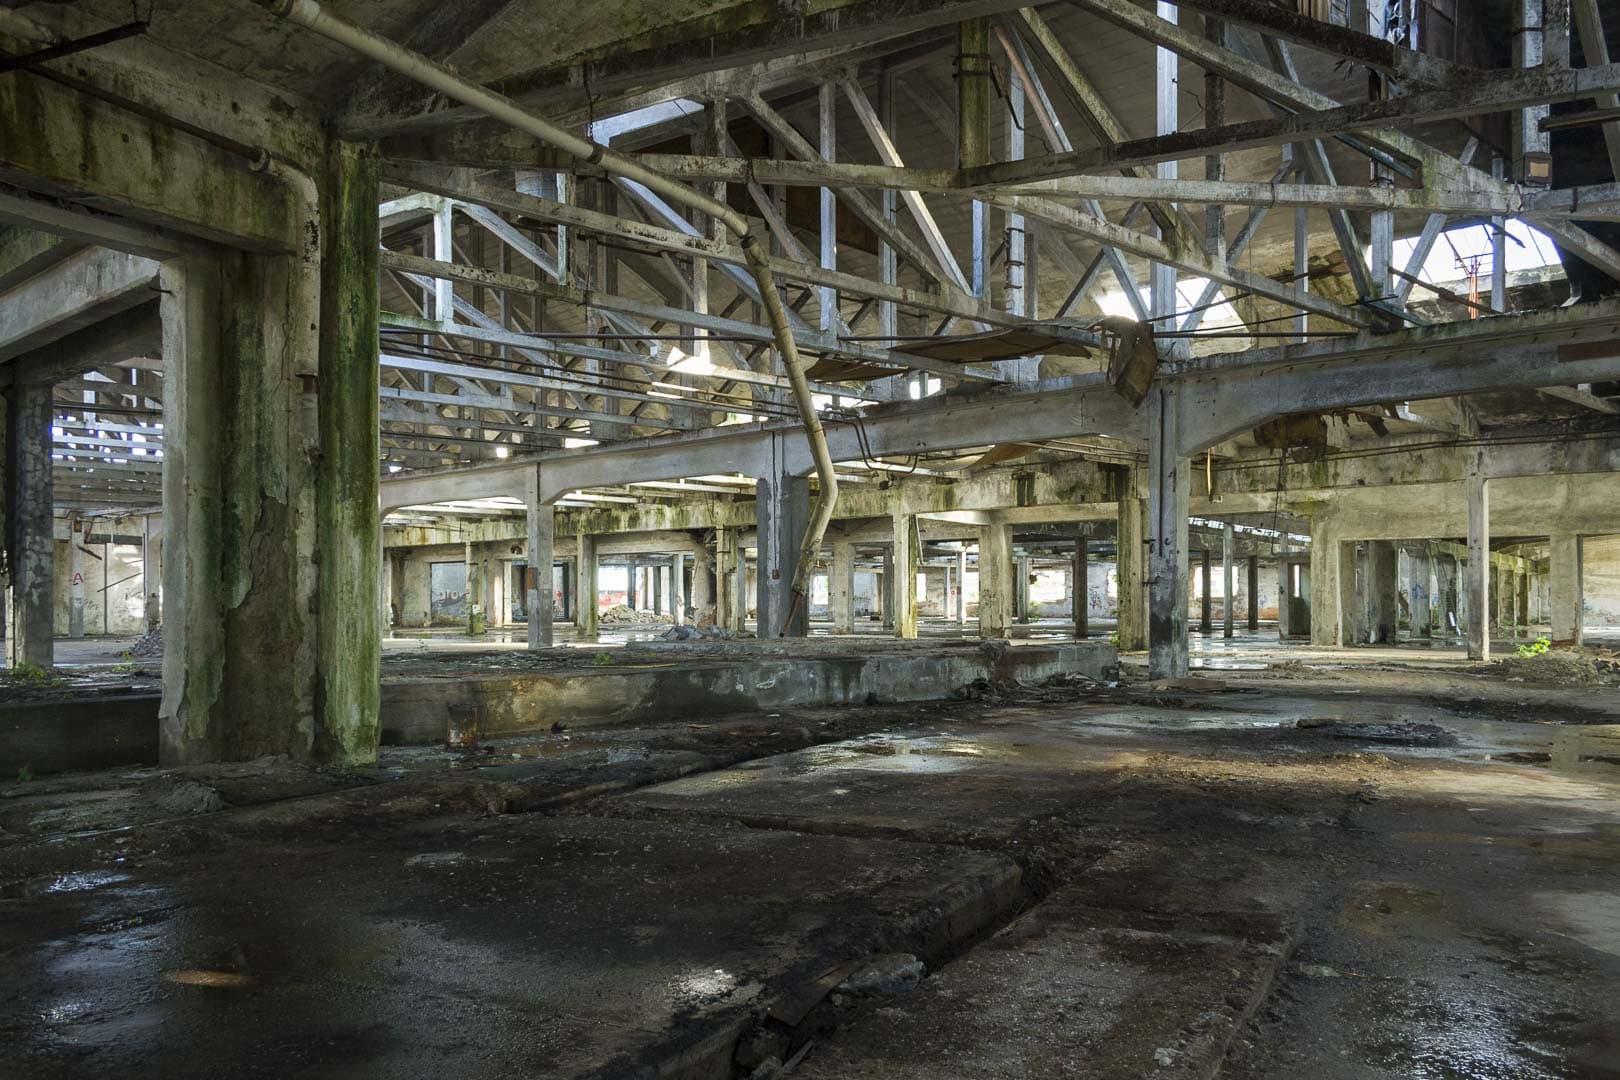 Inside Garis – Abandoned Brakes Factory – Nichelino, Italy